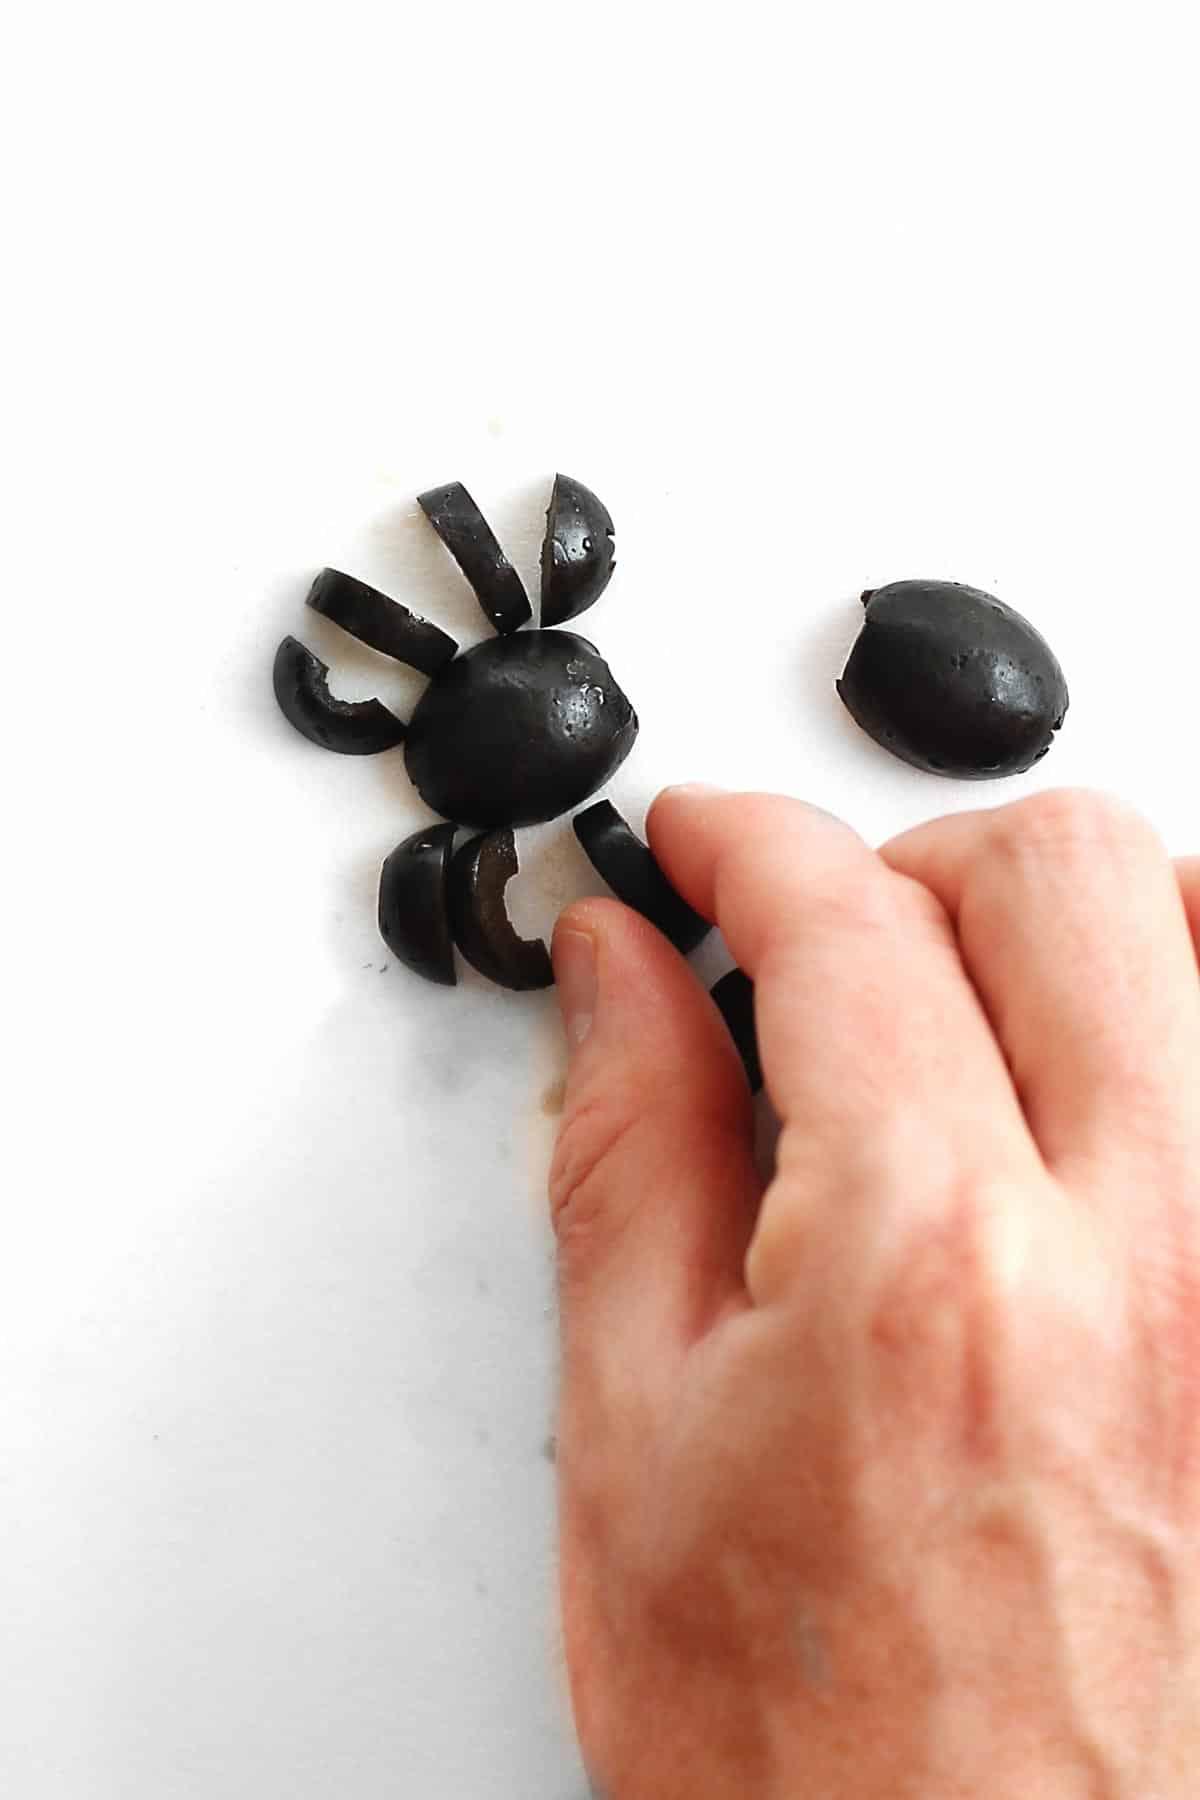 Making black olive spiders